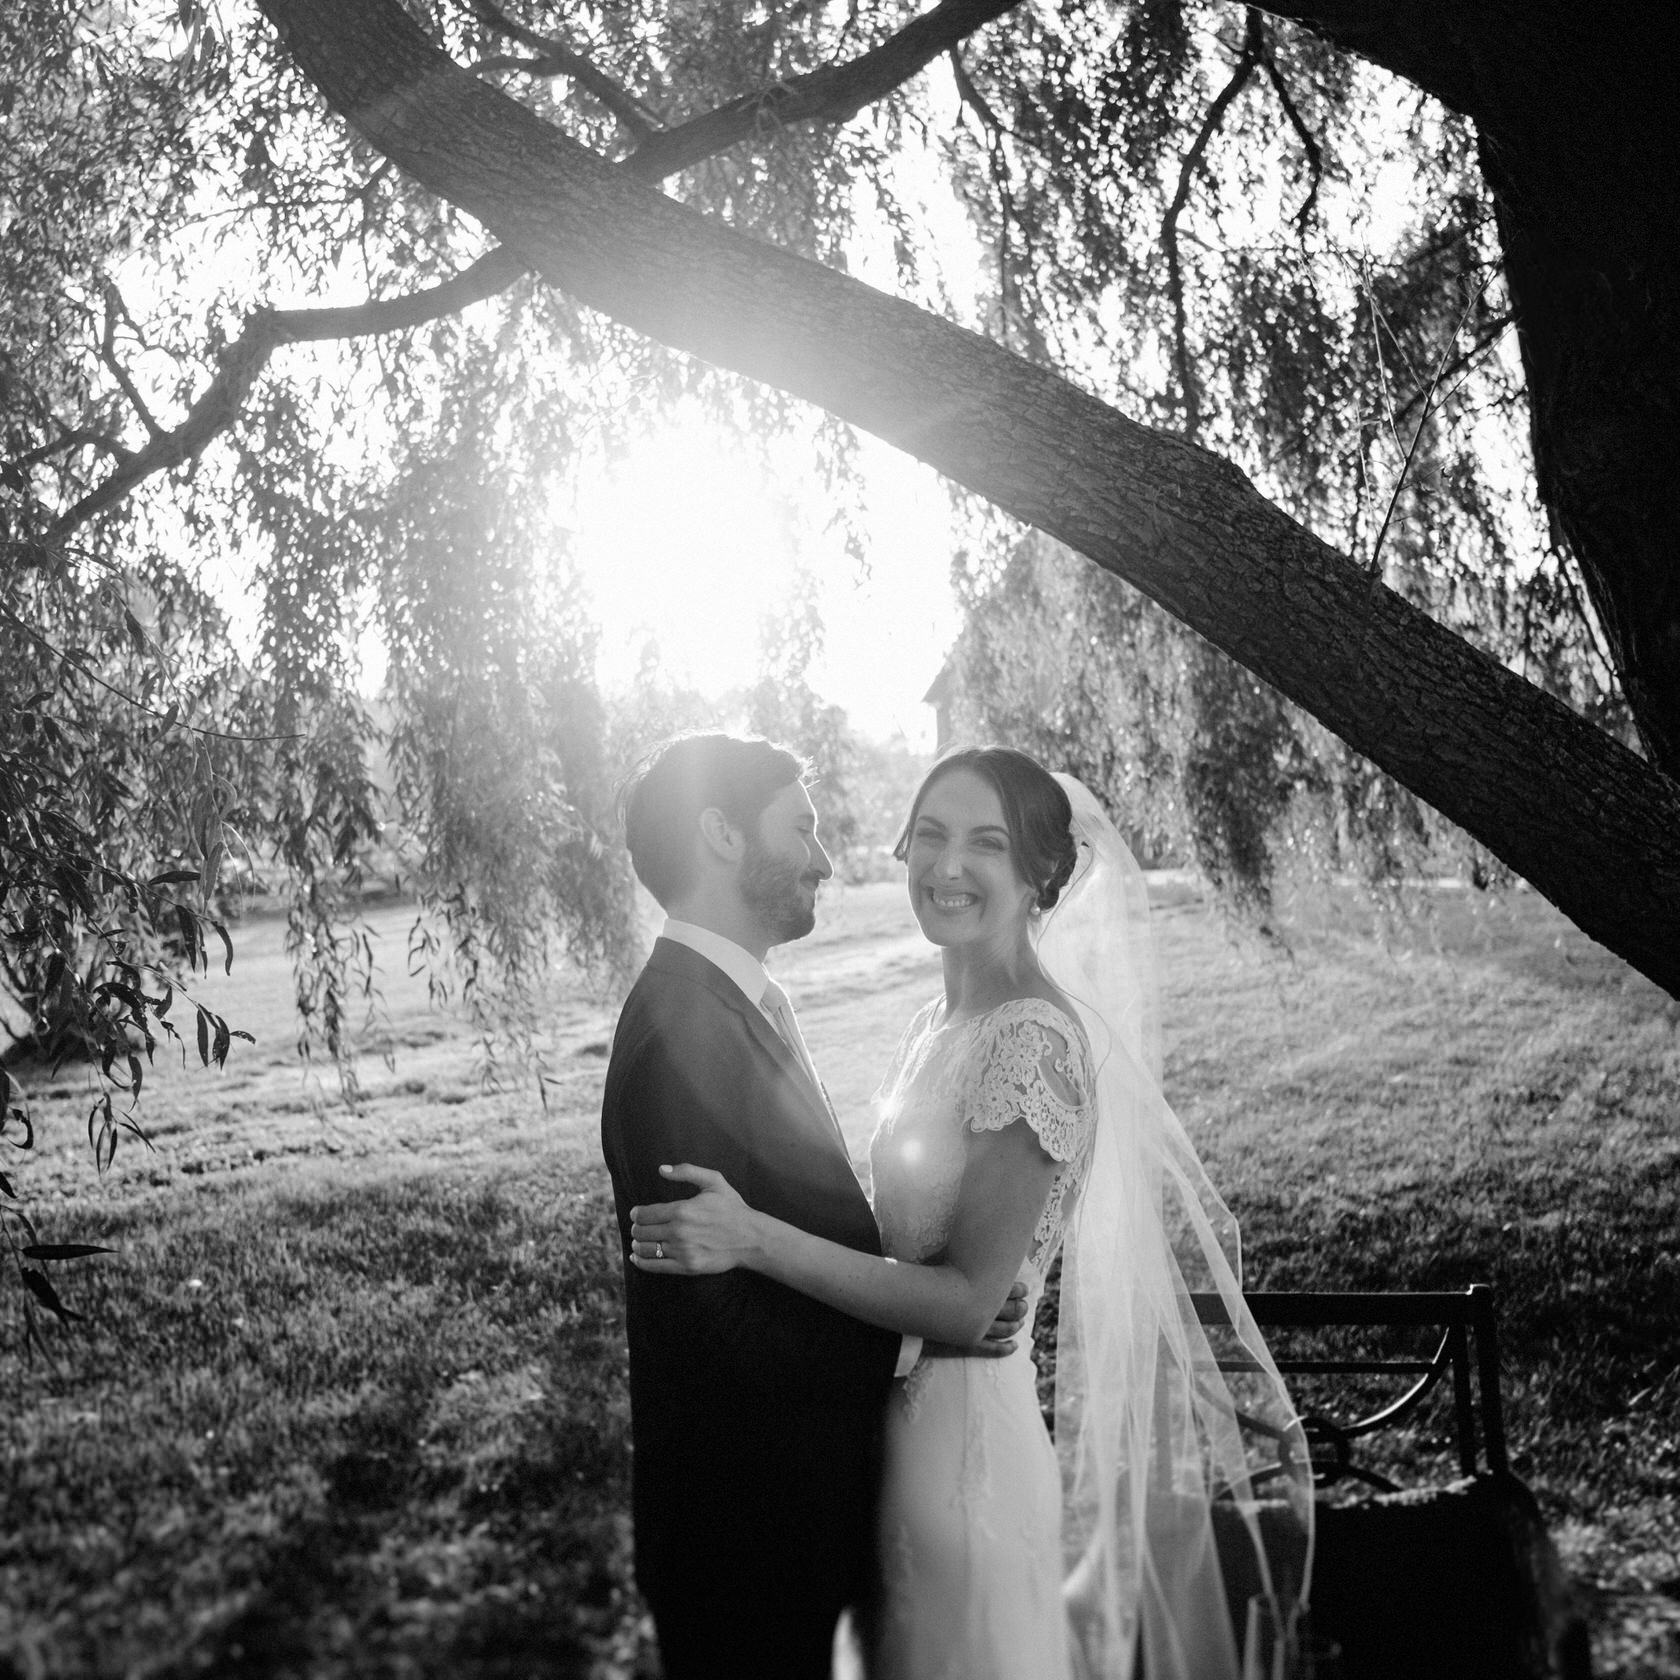 Evermore Weddings & Events bride and groom photos.jpg